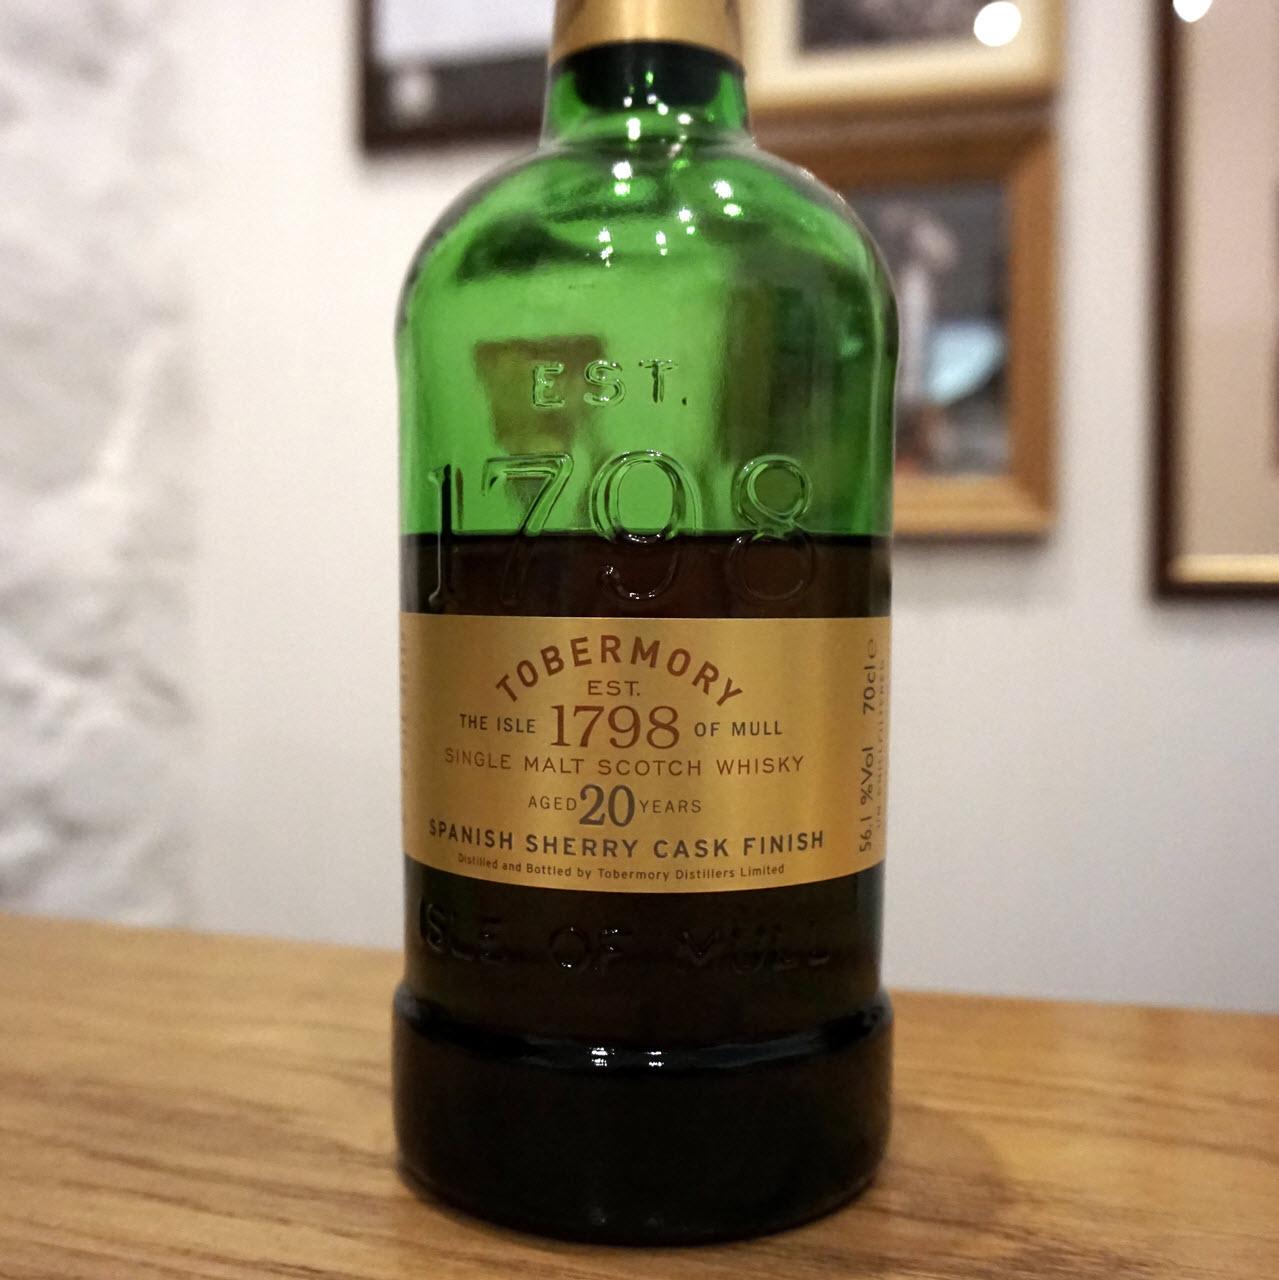 Tobermory 20 YO Spanish Sherry Cask Finish - Distillery Exclusive